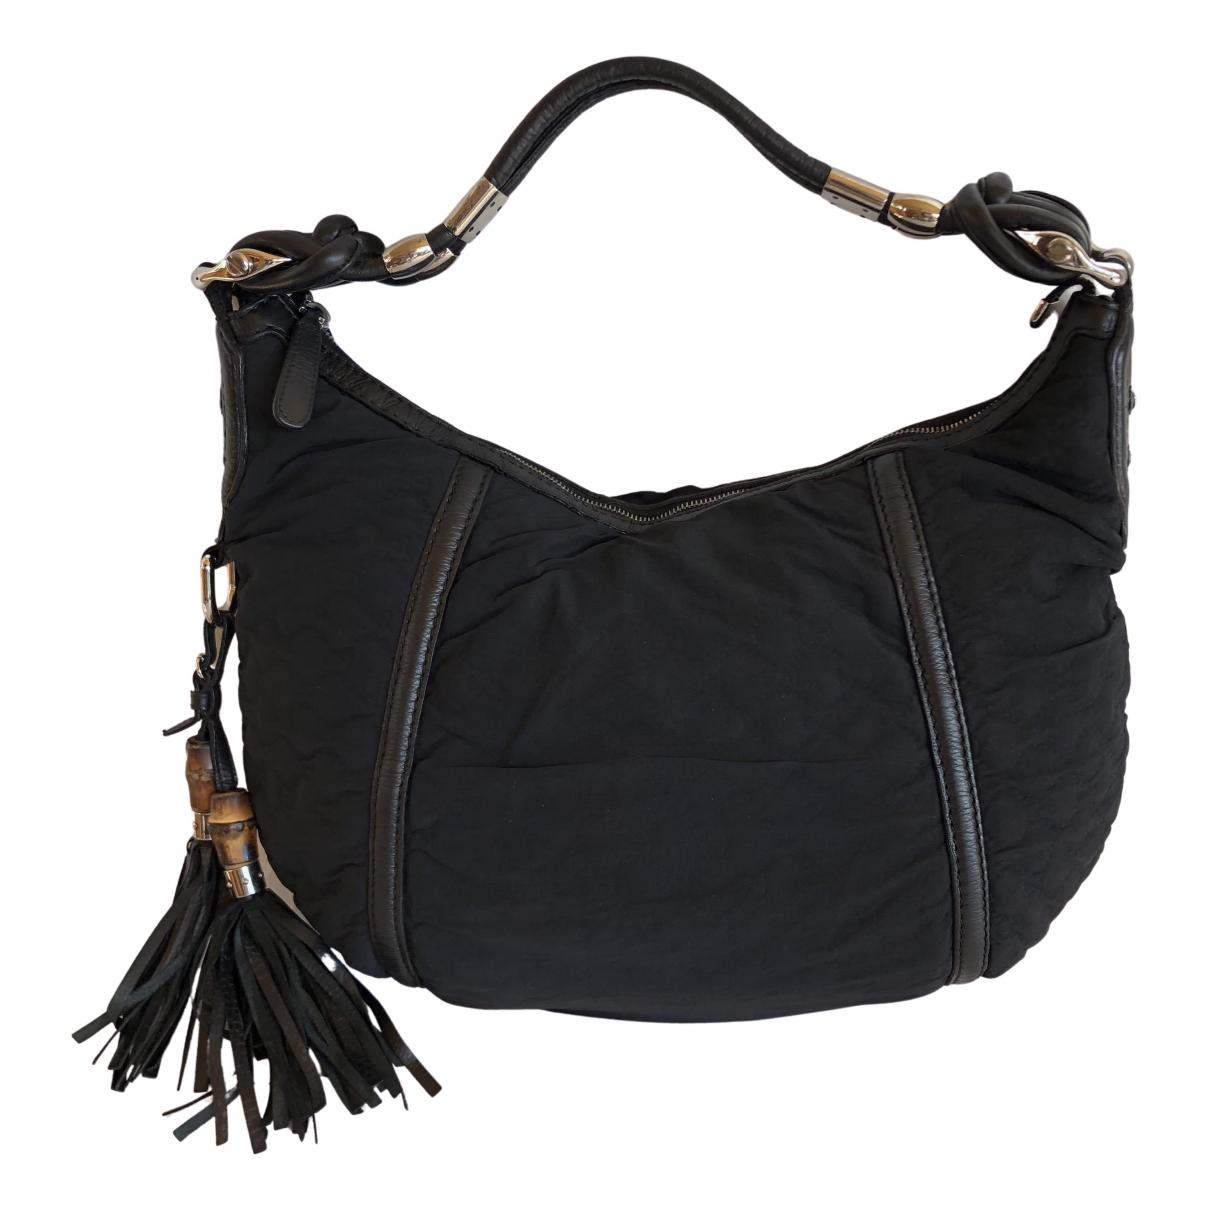 Gucci \N Black handbag for Women \N